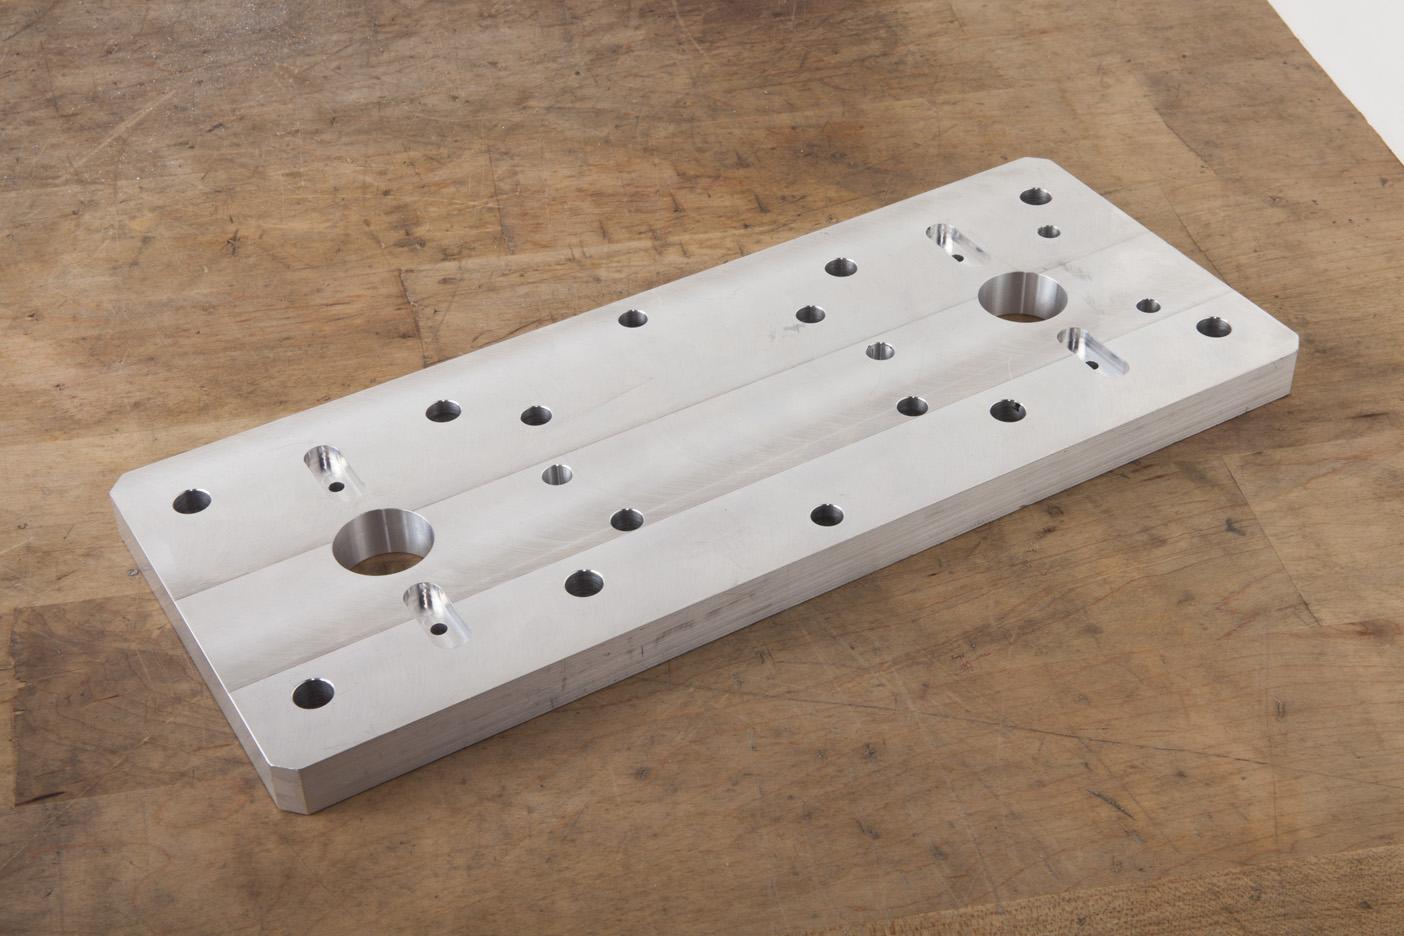 Automation Equipment, MIC-6 Cast Aluminum, PS95 CNC Mill, 2 setups, low volume, anodized finish